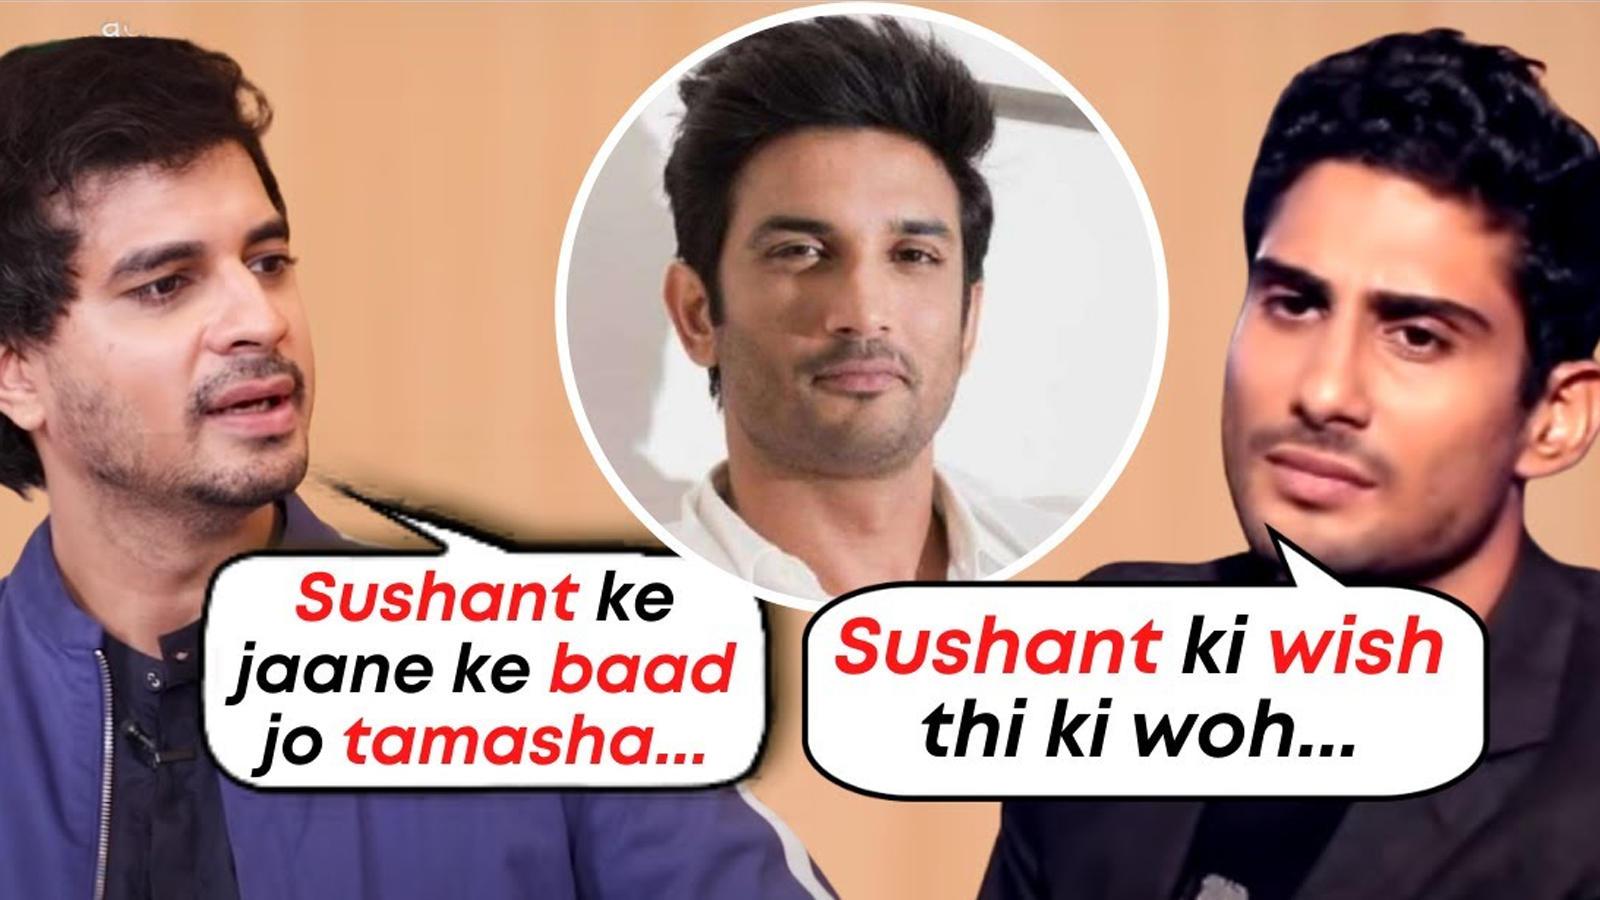 Remembering Sushant Singh Rajput: Prateik Babbar and Tahir Raj Bhasin miss their 'Chhichhore' co-star | Hindi Movie News – Bollywood – Times of India